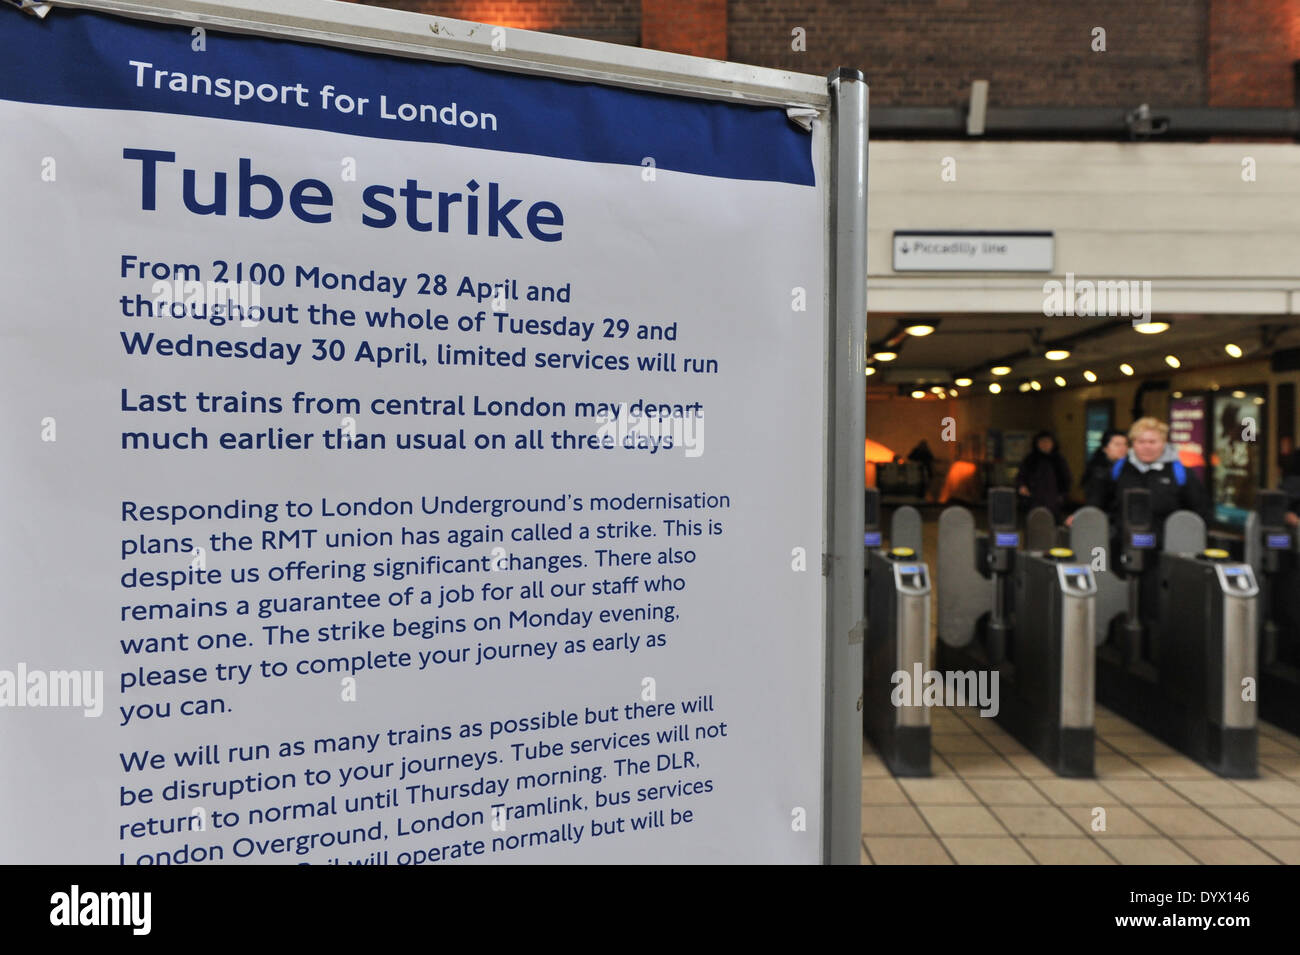 Turnpike Lane Station, London, UK. 26th April 2014. A notice in Turnpike Lane station alerting travellers of next weeks 48hr tube strike. Credit:  Matthew Chattle/Alamy Live News - Stock Image